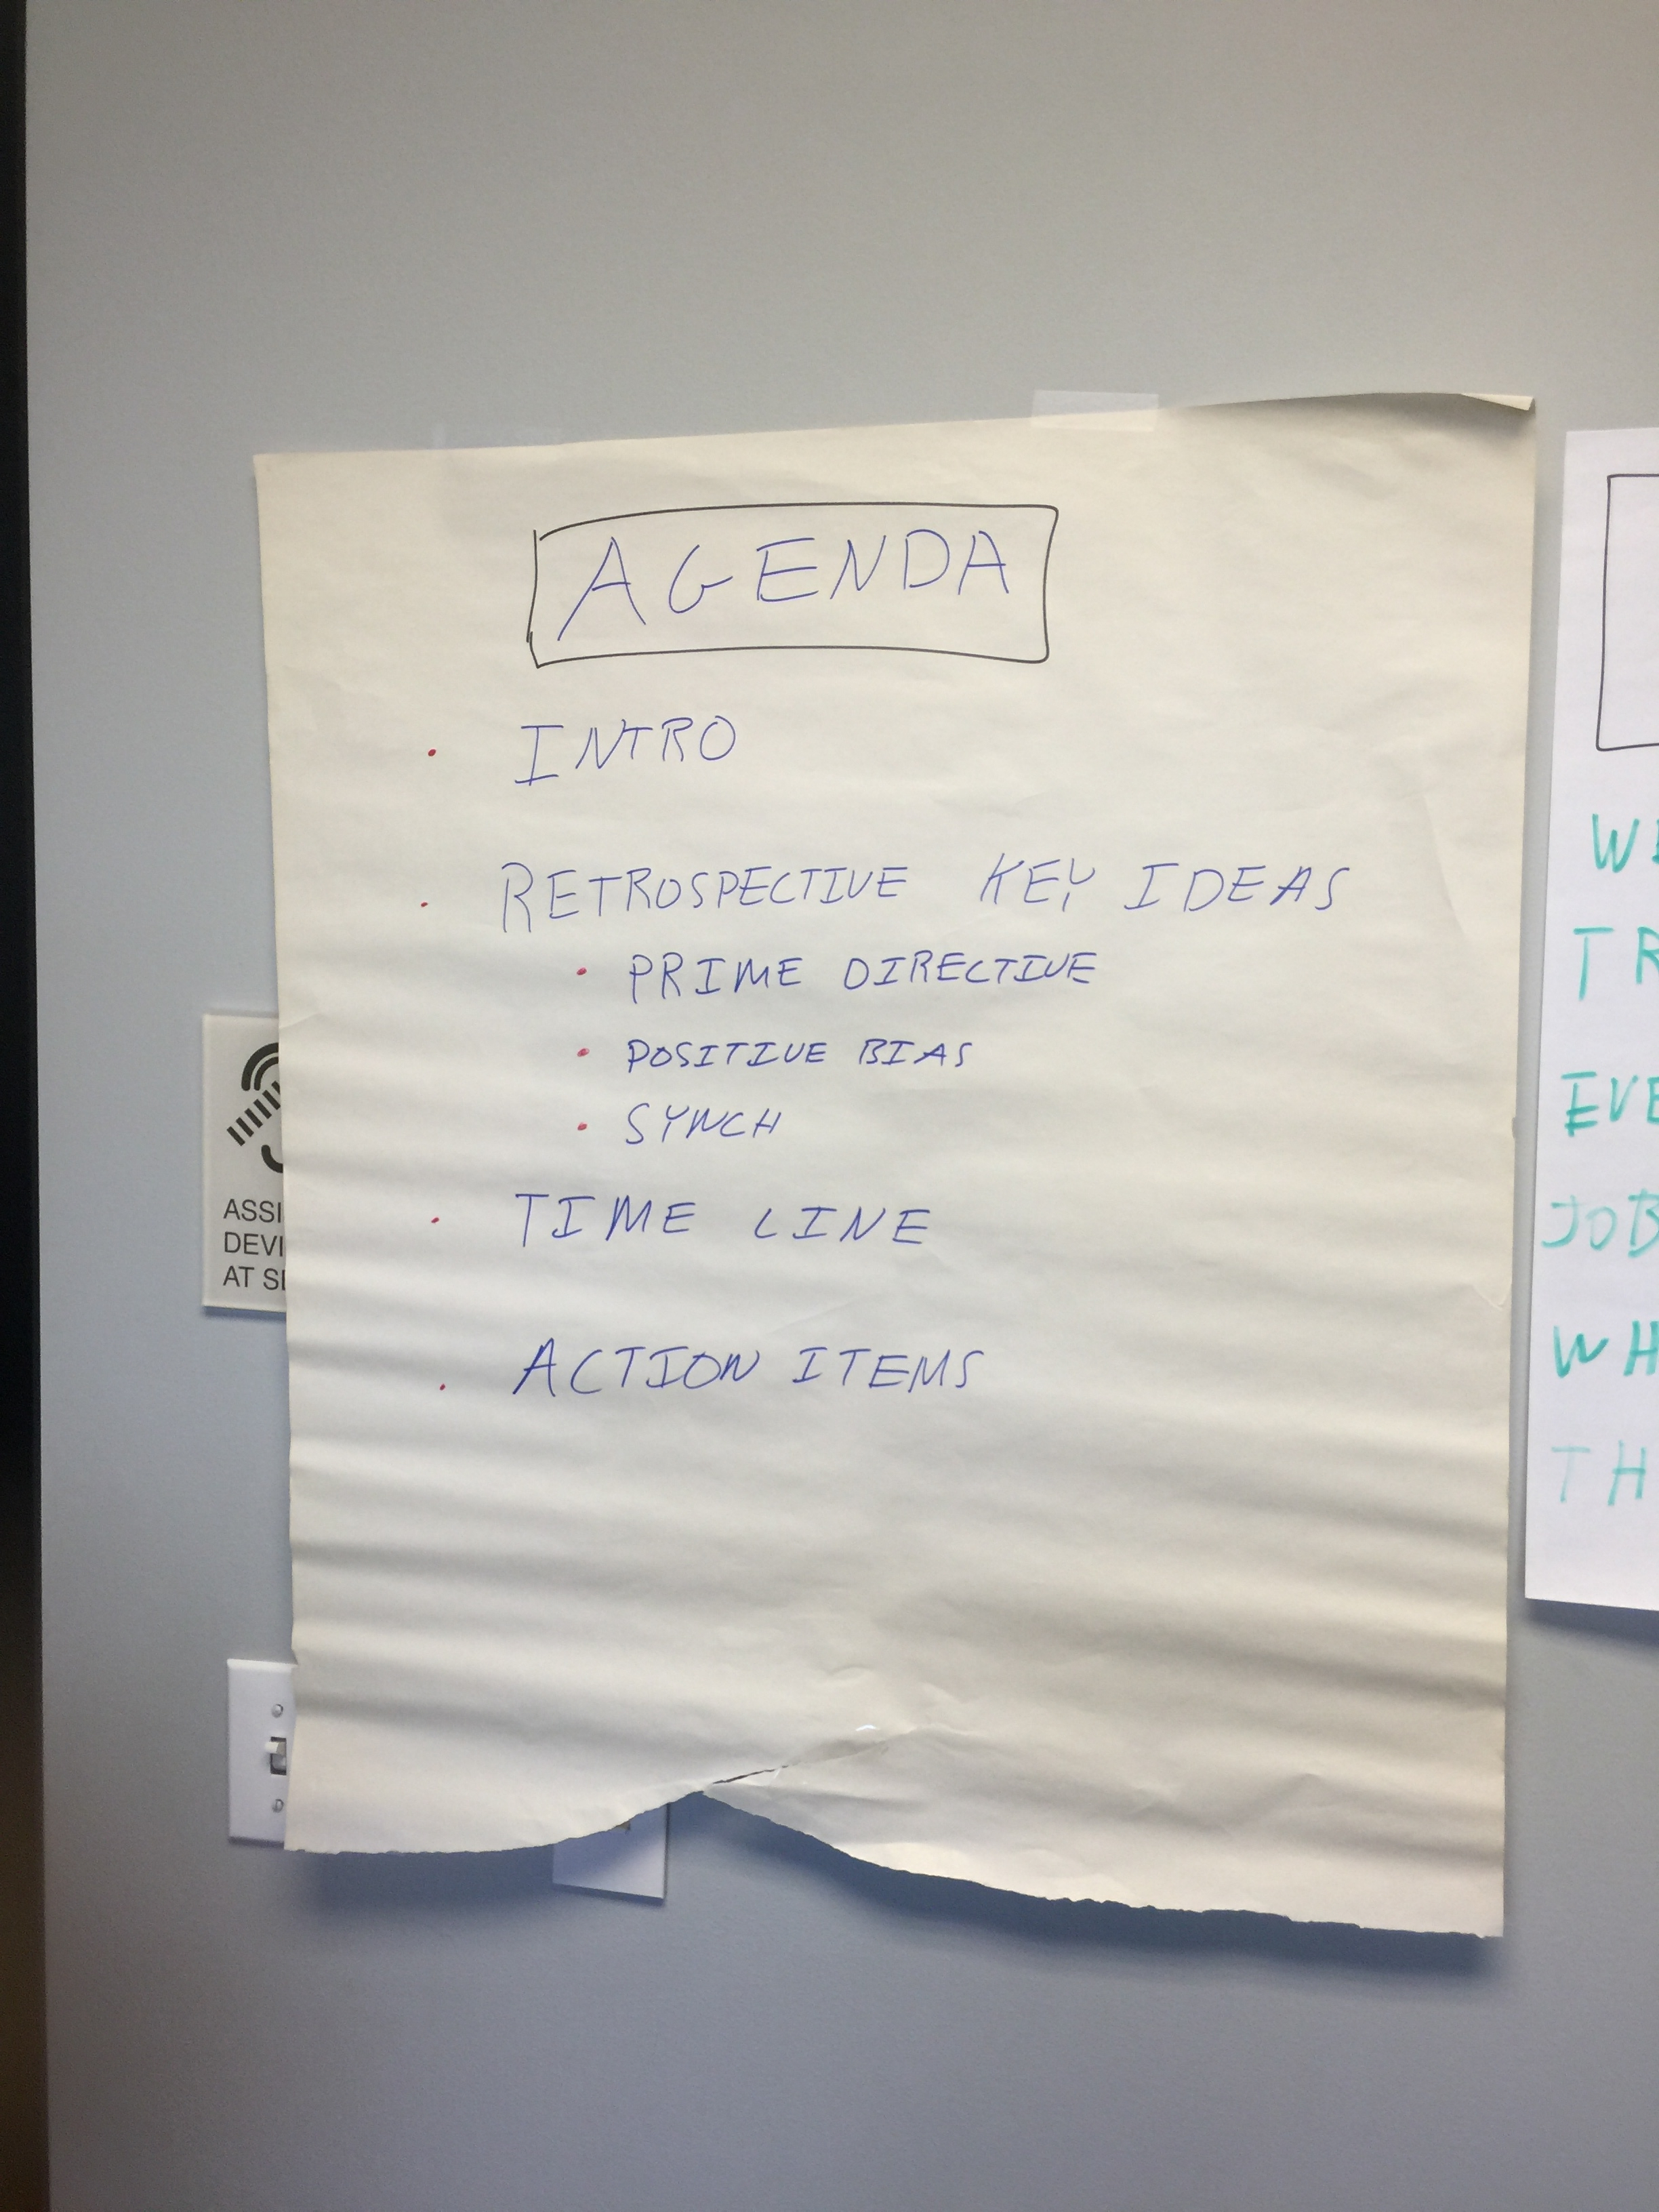 Timeline Retrospective - Agenda